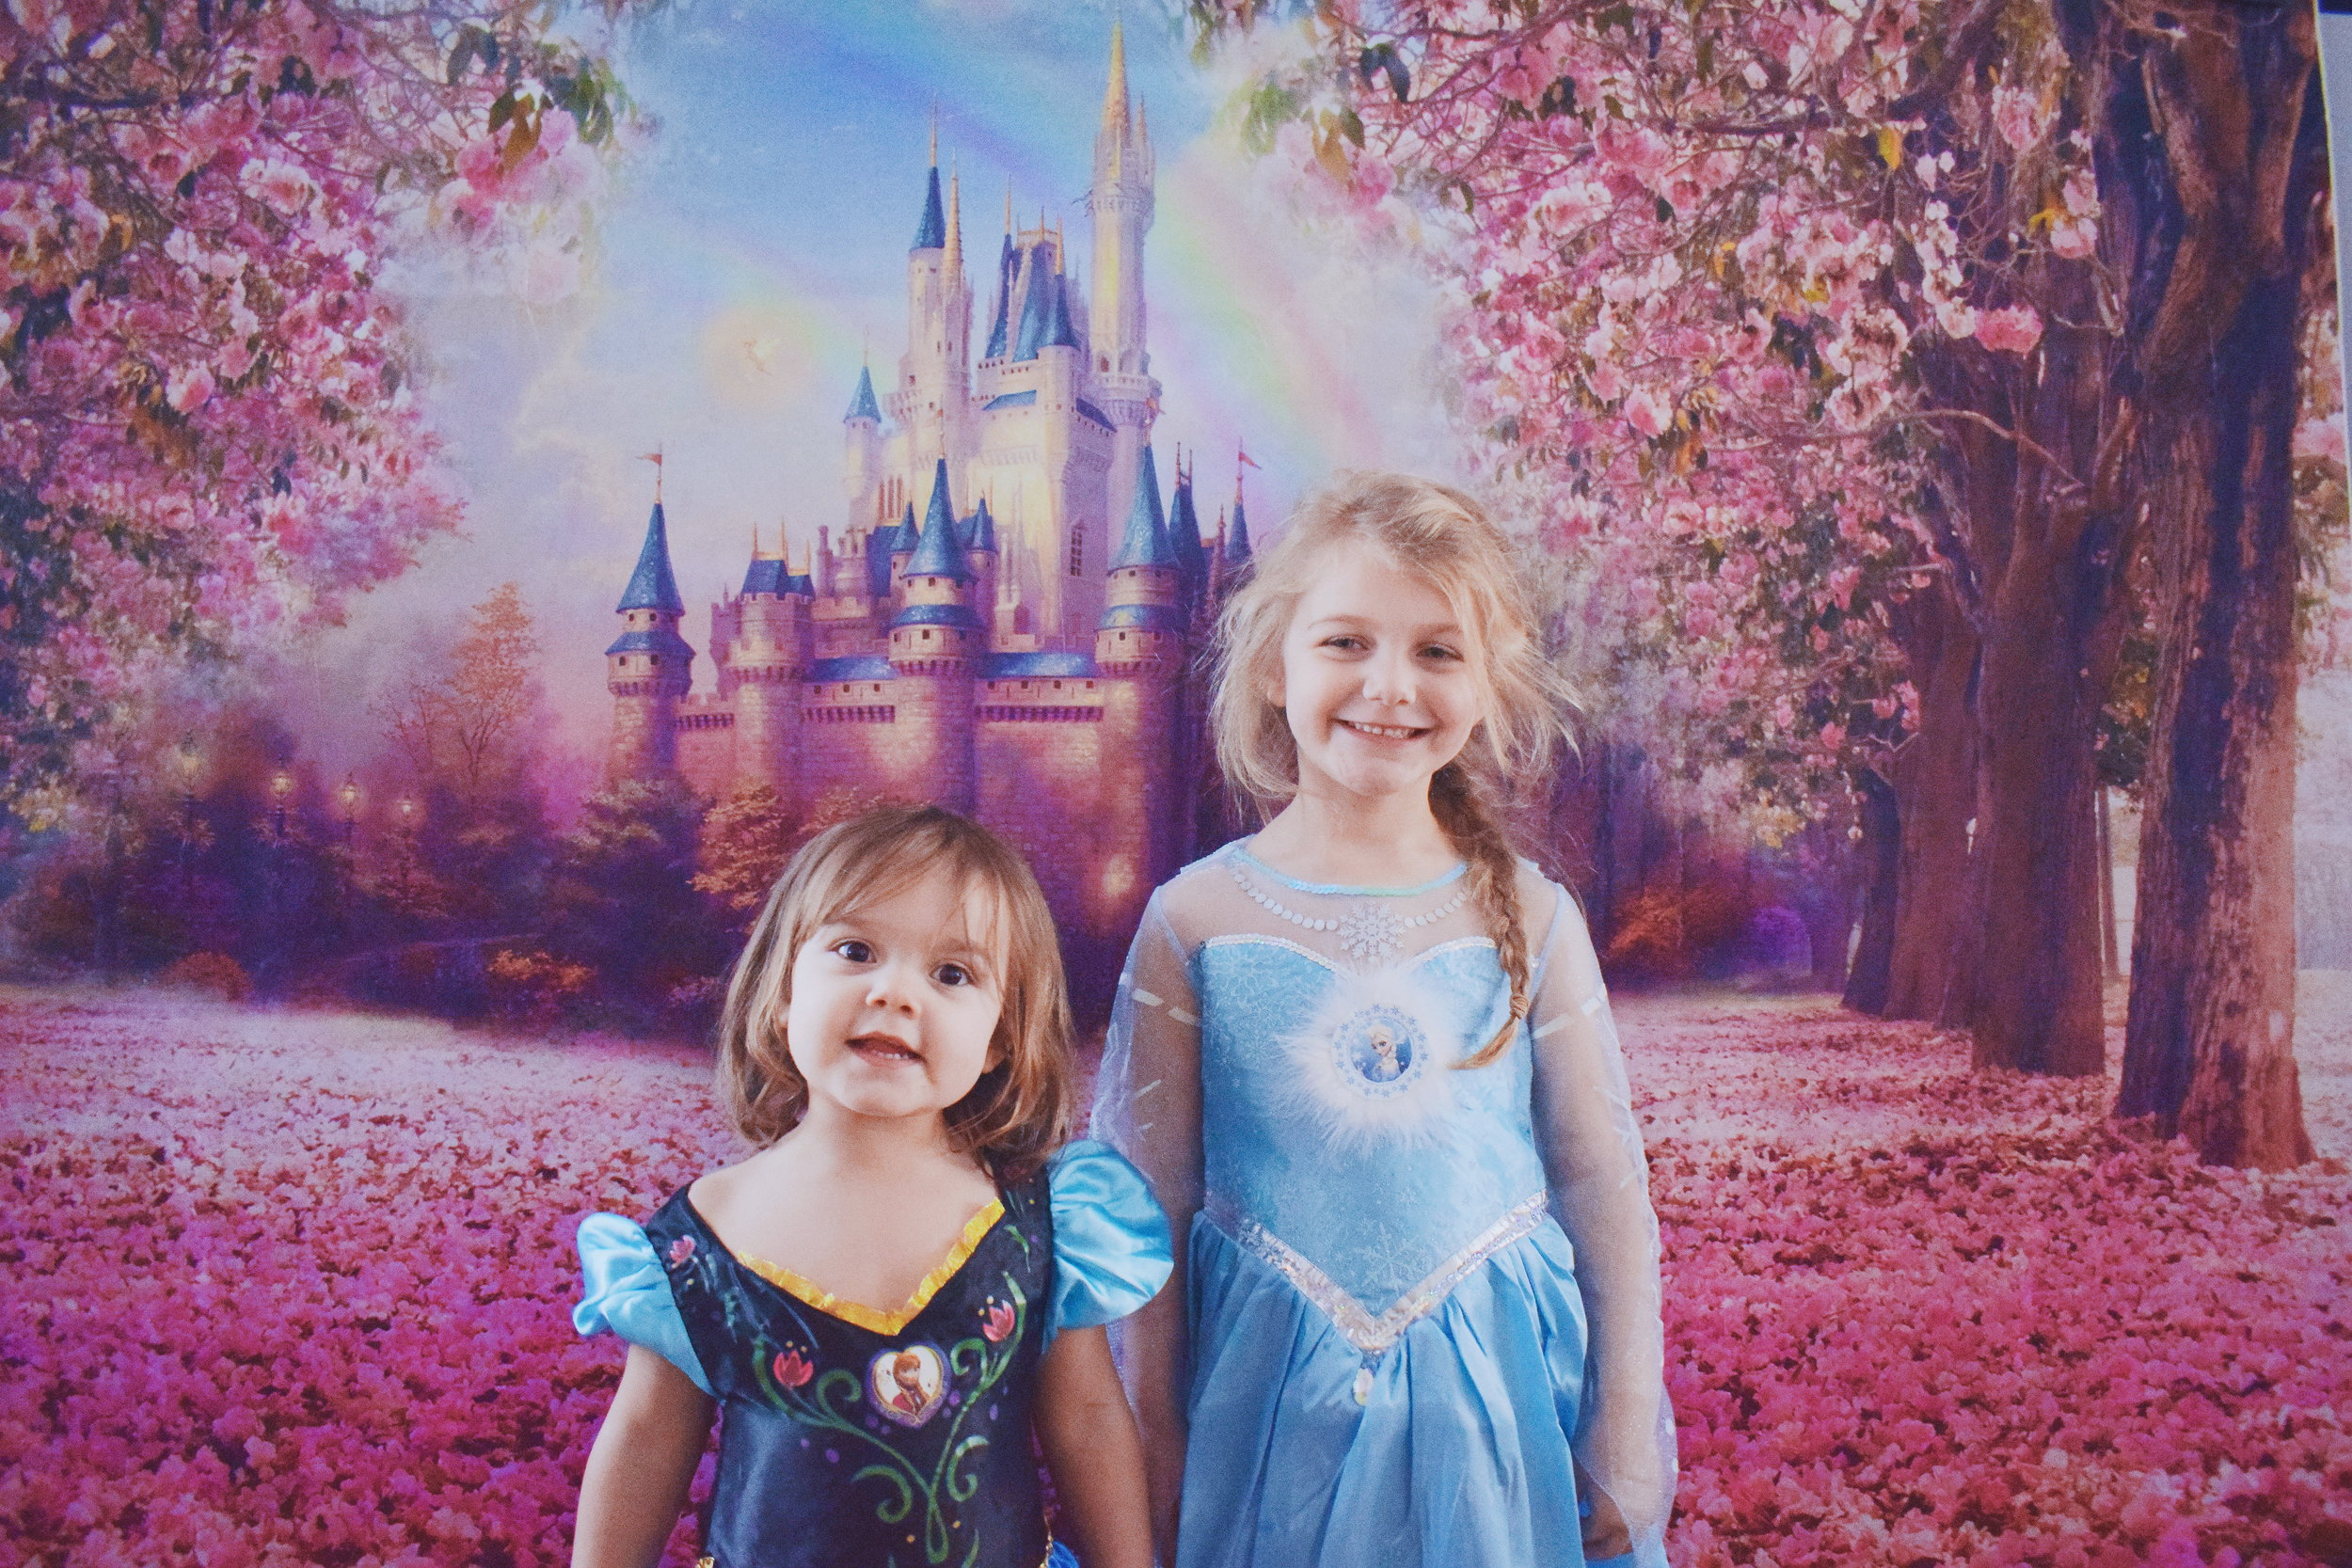 Disney's Frozen Anna and Elsa